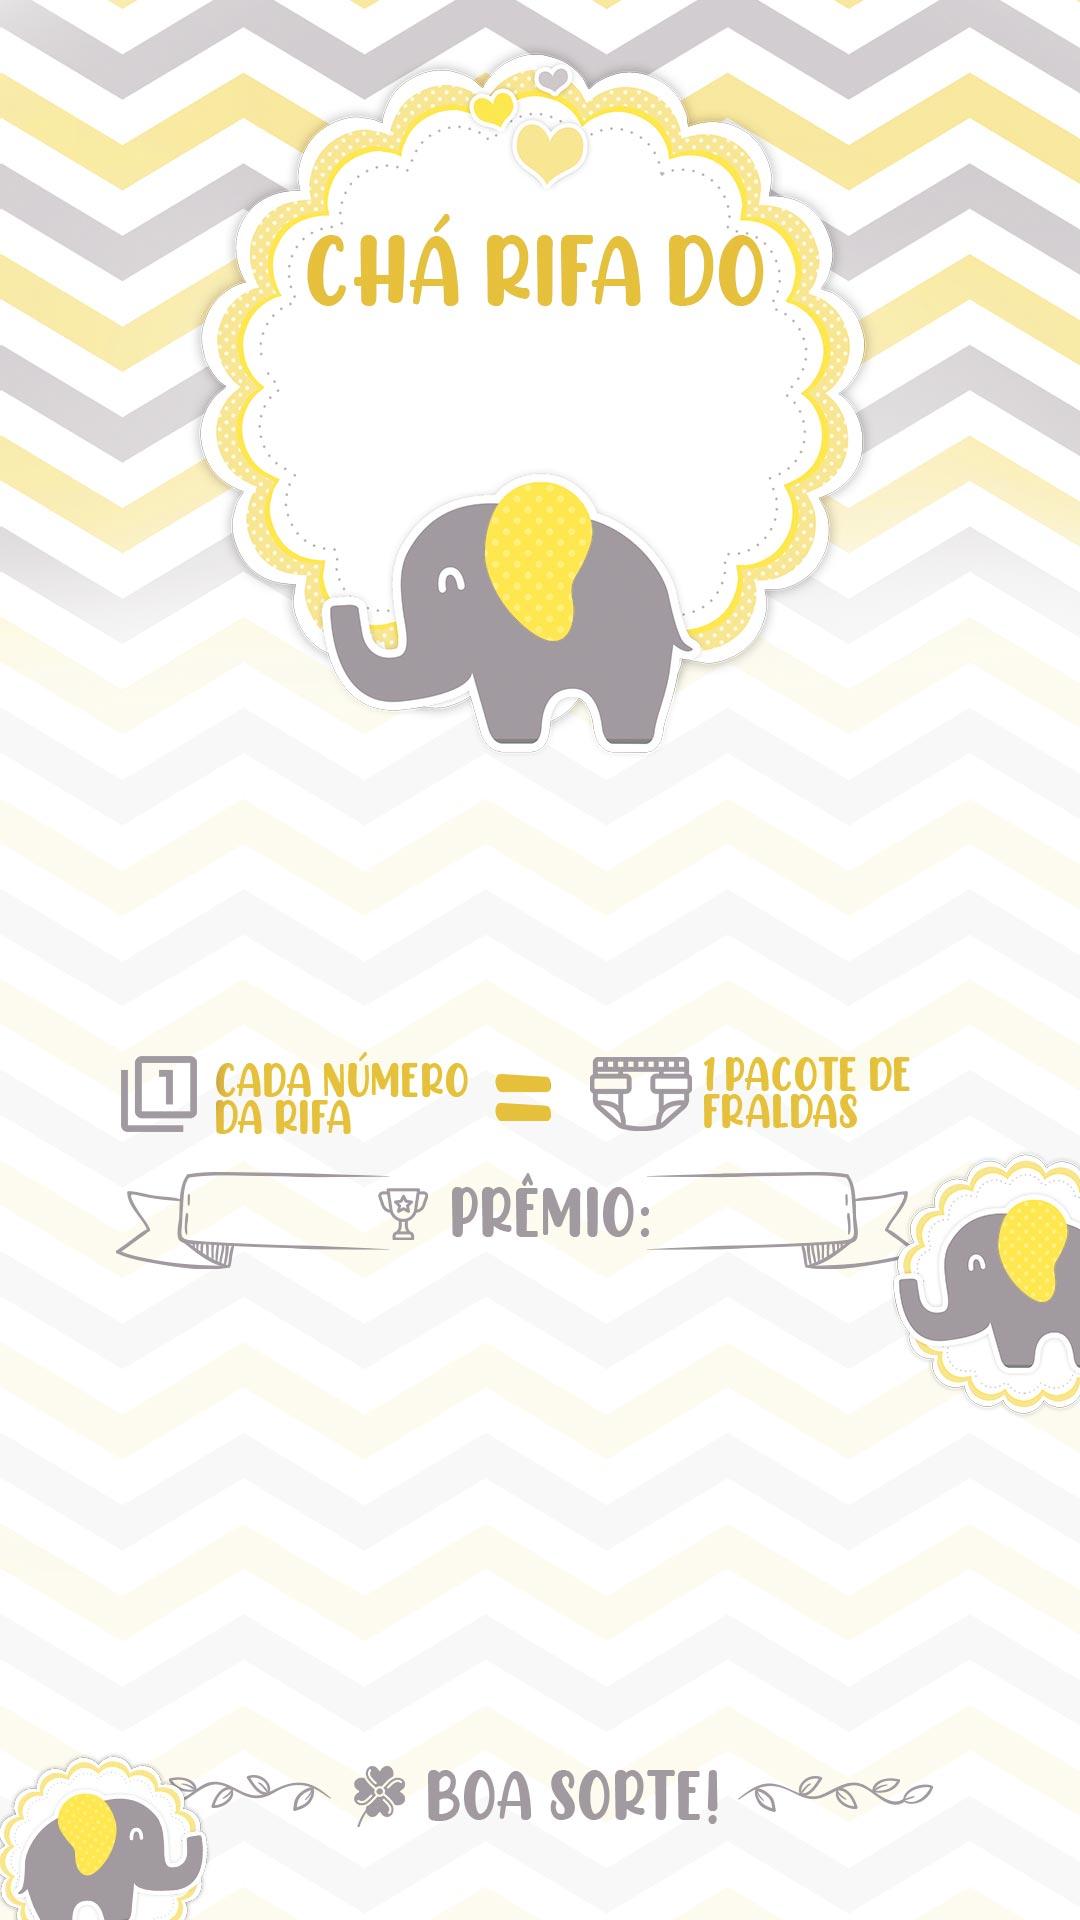 Convite Rifa Elefantinho Amarelo